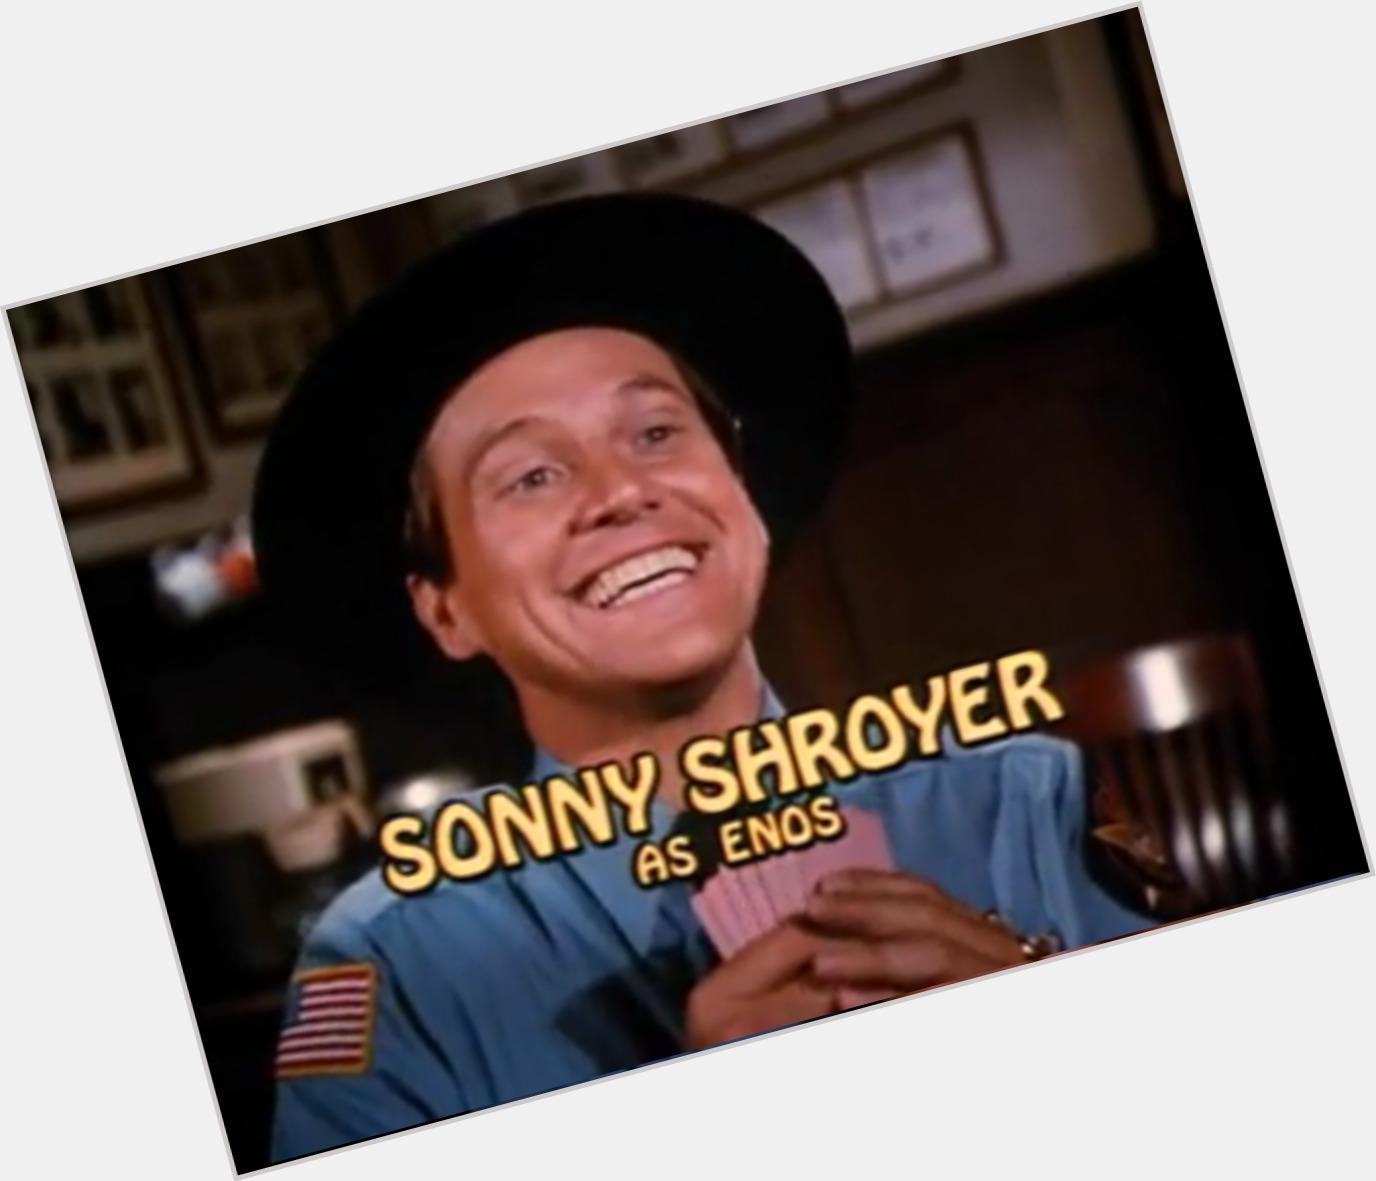 sonny shroyer biography